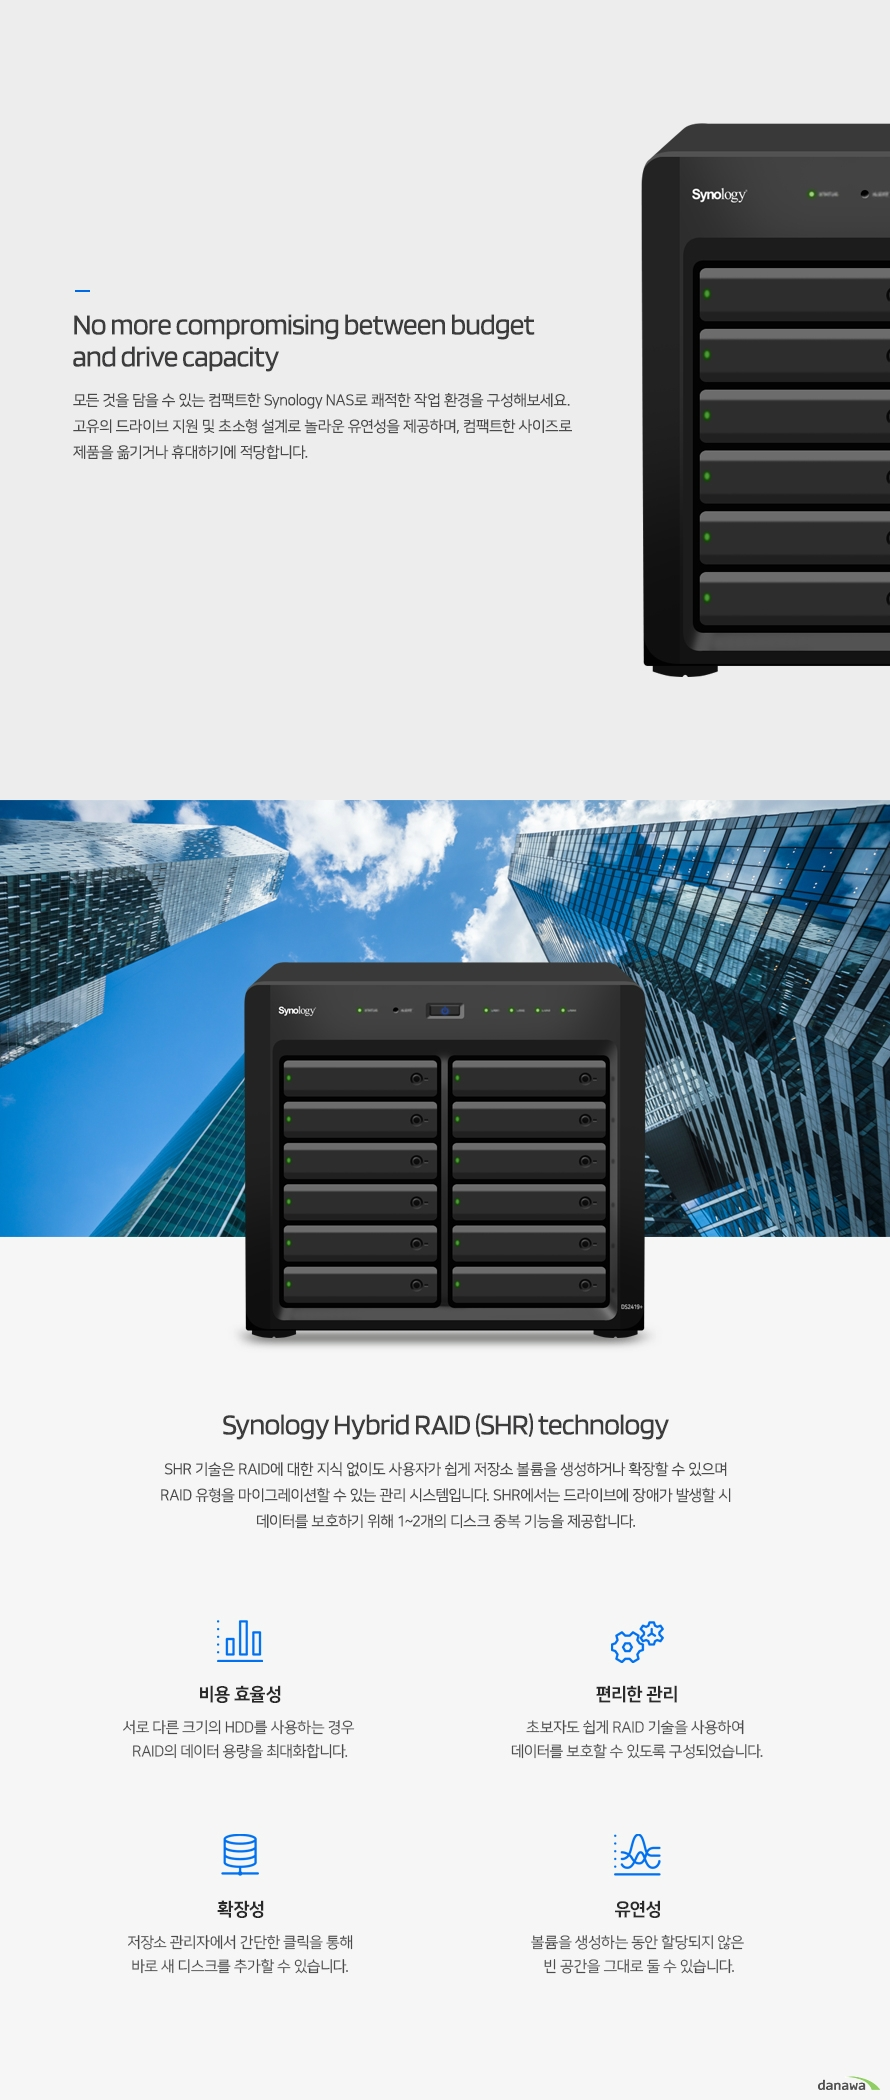 Synology DS2419+ RAM 4GB (36TB)